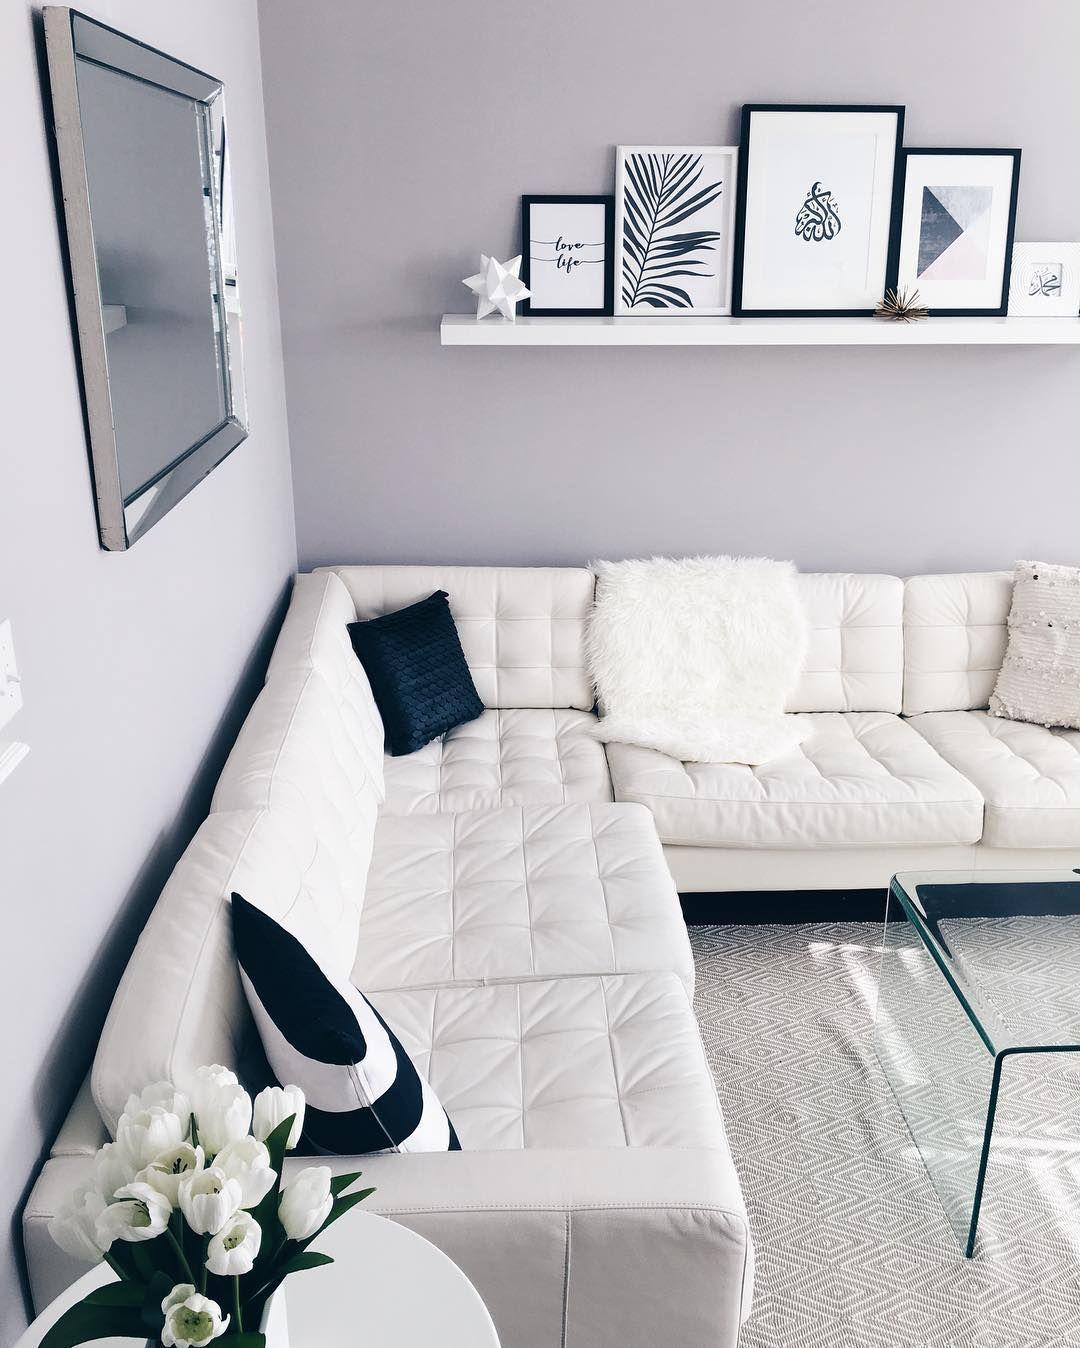 Miraculous Ikea Landskrona Sectional Sofa In 2019 Living Room Sofa Inzonedesignstudio Interior Chair Design Inzonedesignstudiocom